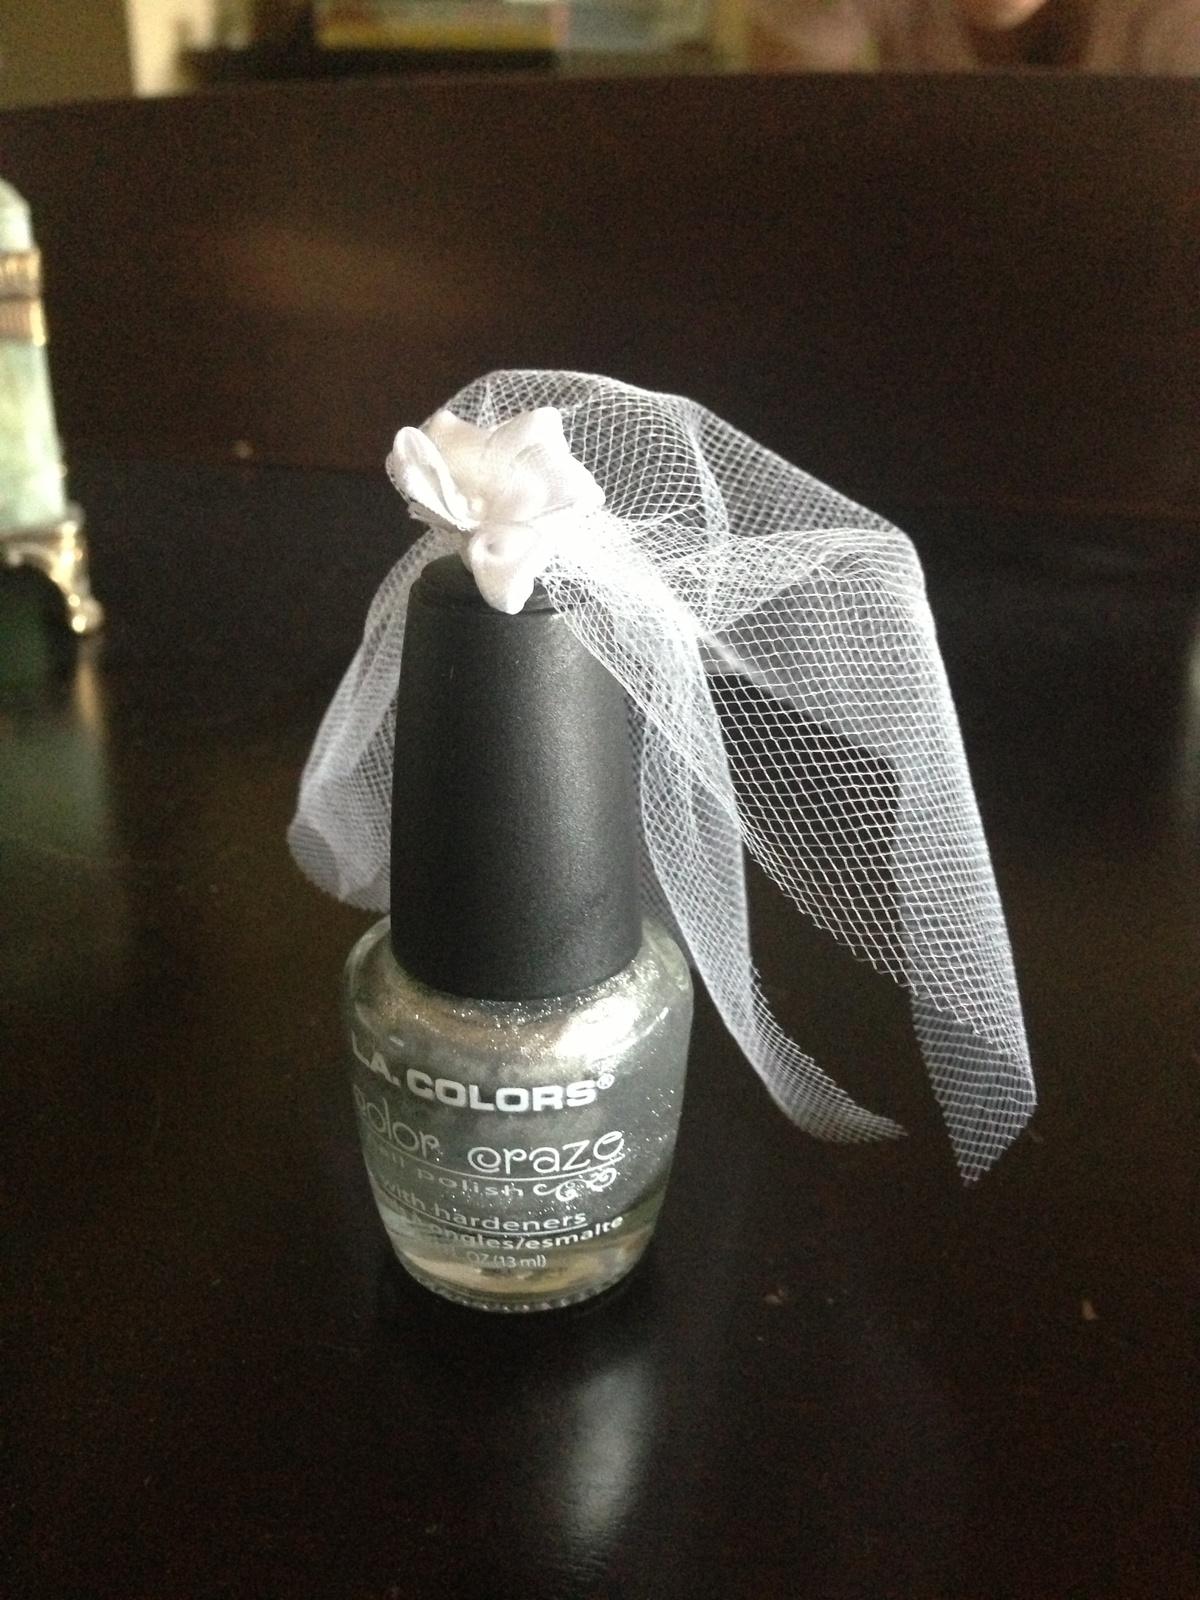 Bridal Shower Veil Nail Polish Favors That I Made